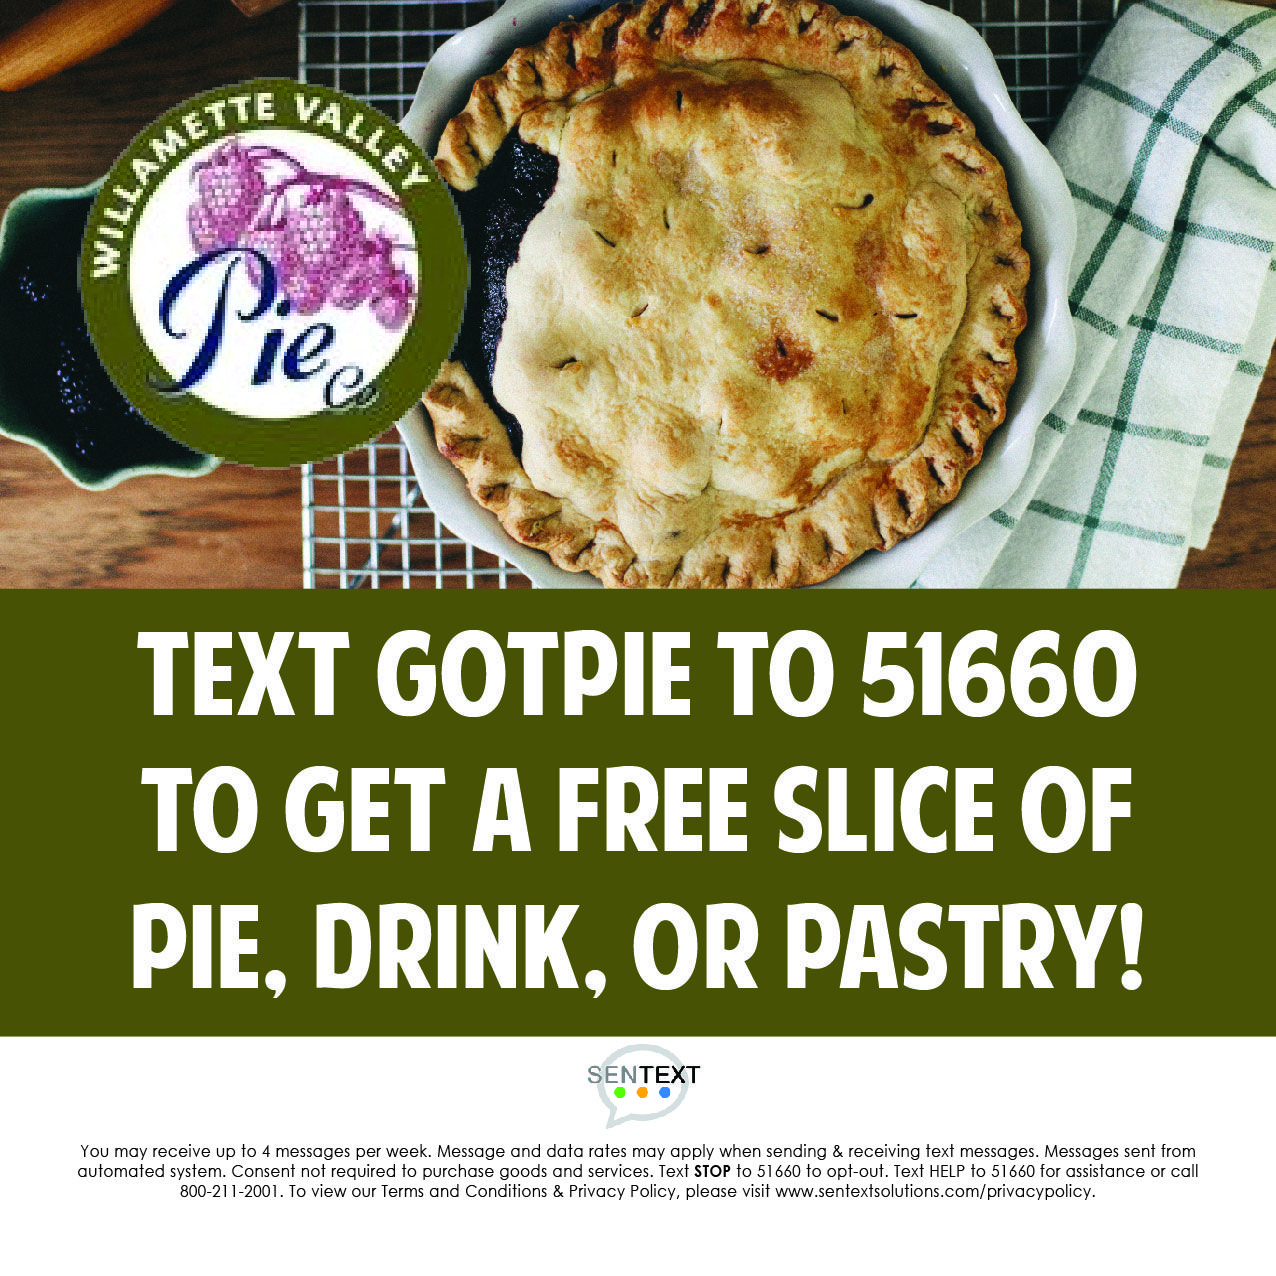 Home Willamette Valley Pie Company Pie Company Willamette Valley Pie